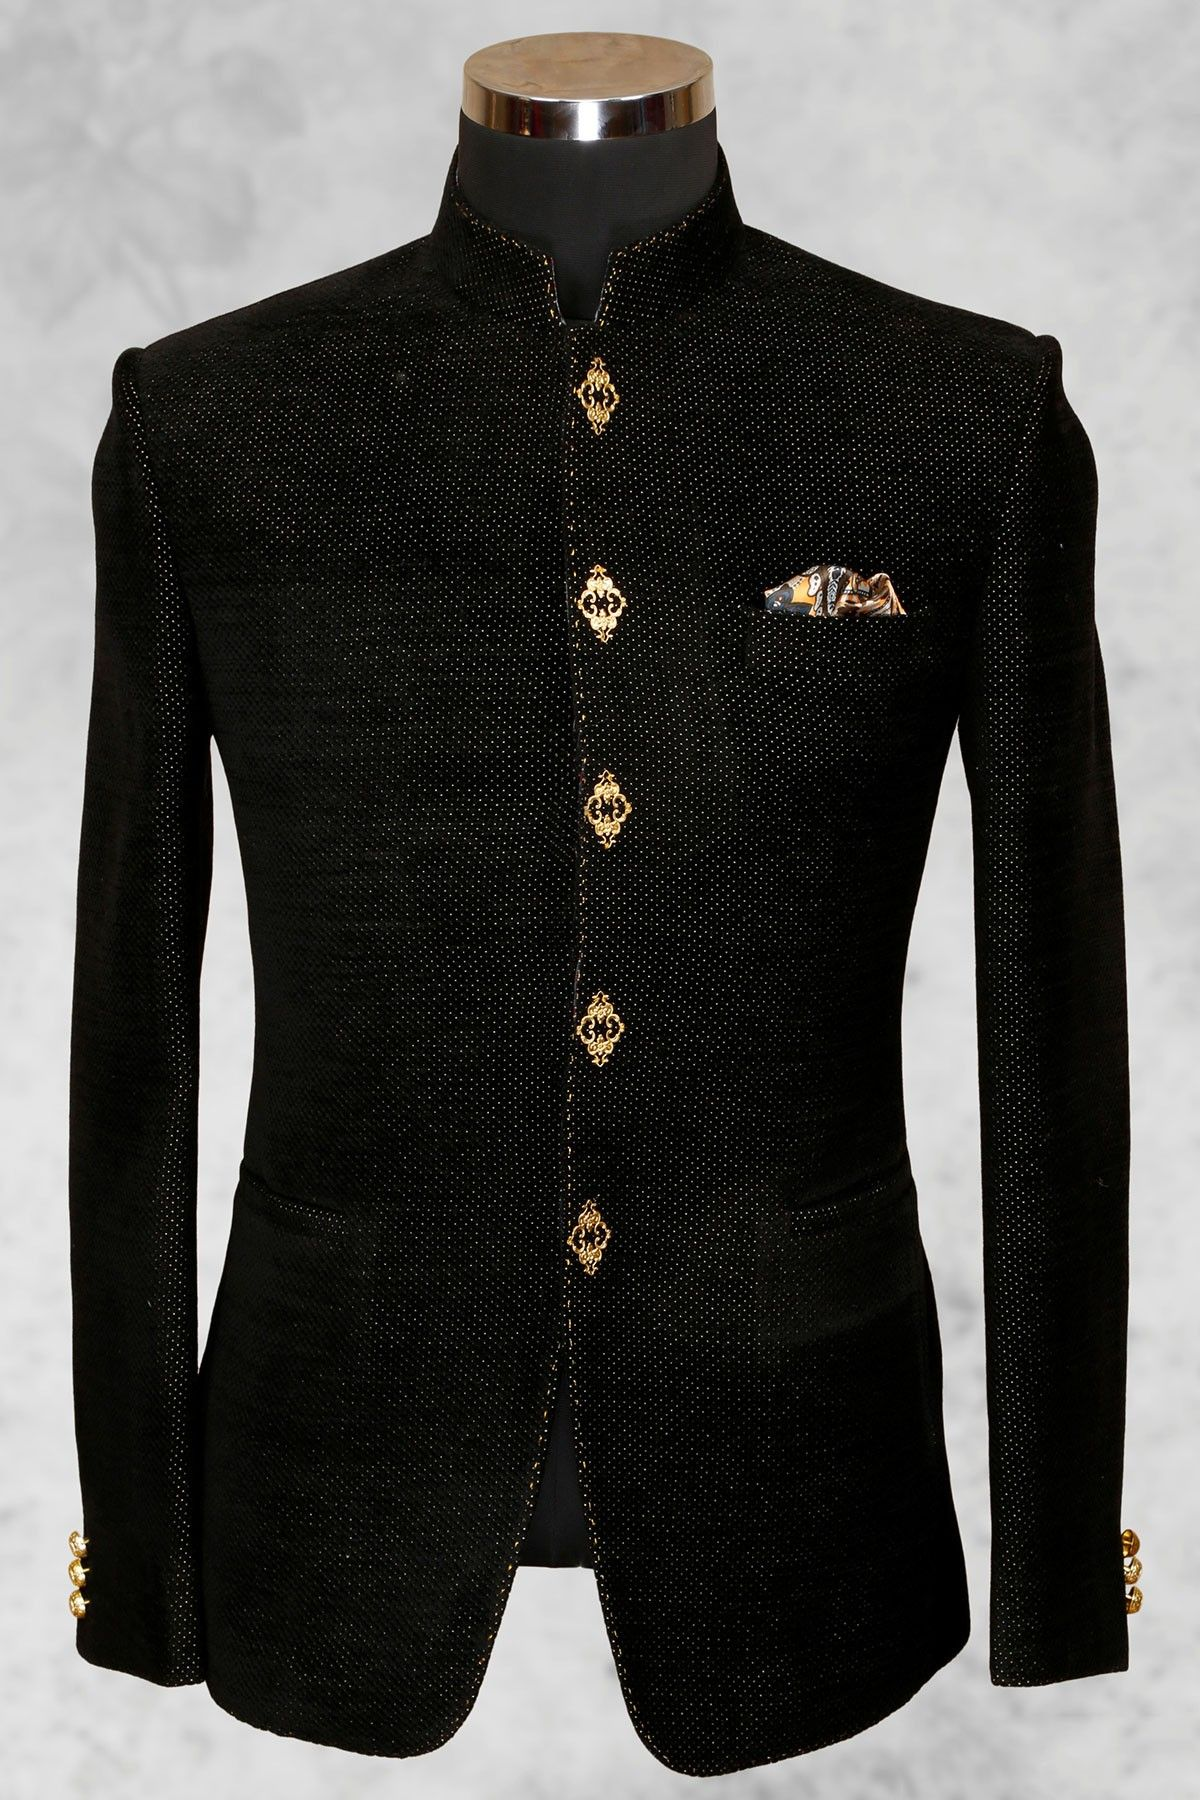 Black well dressed jute suit with bandhgala collarst jodhpuri